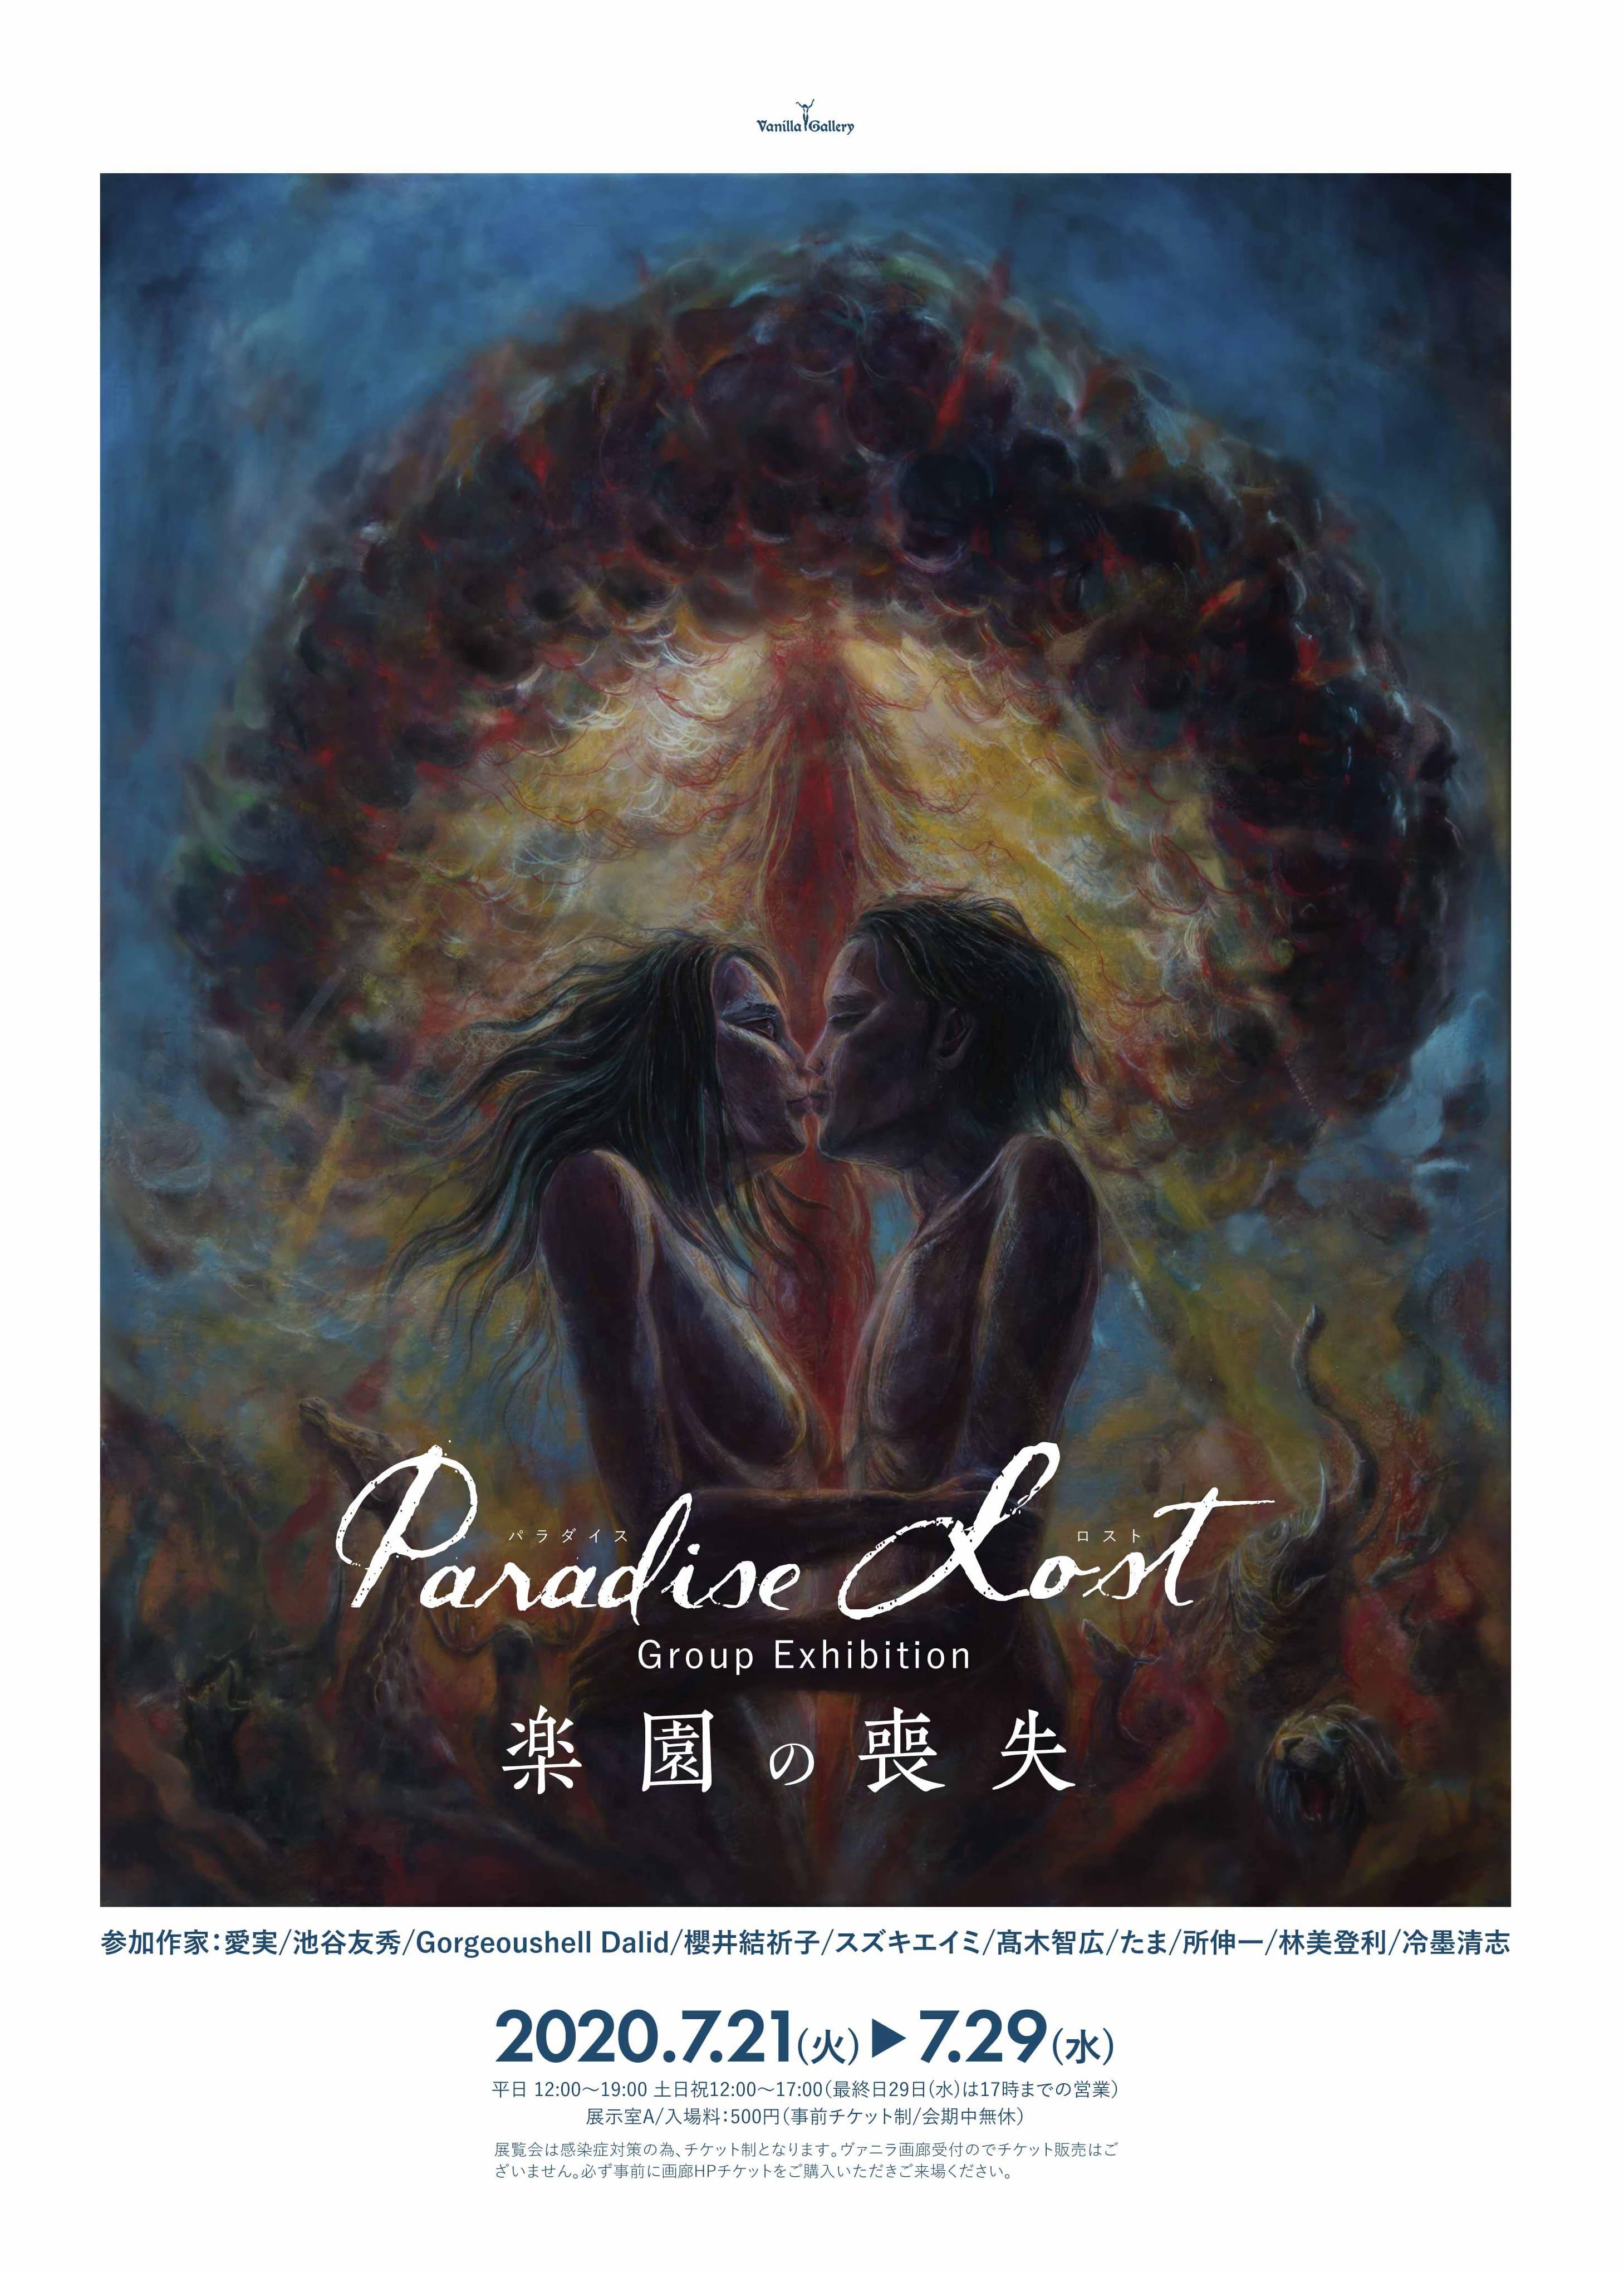 「Paradise Lost ~楽園の喪失~」グループ展 7月26日チケット